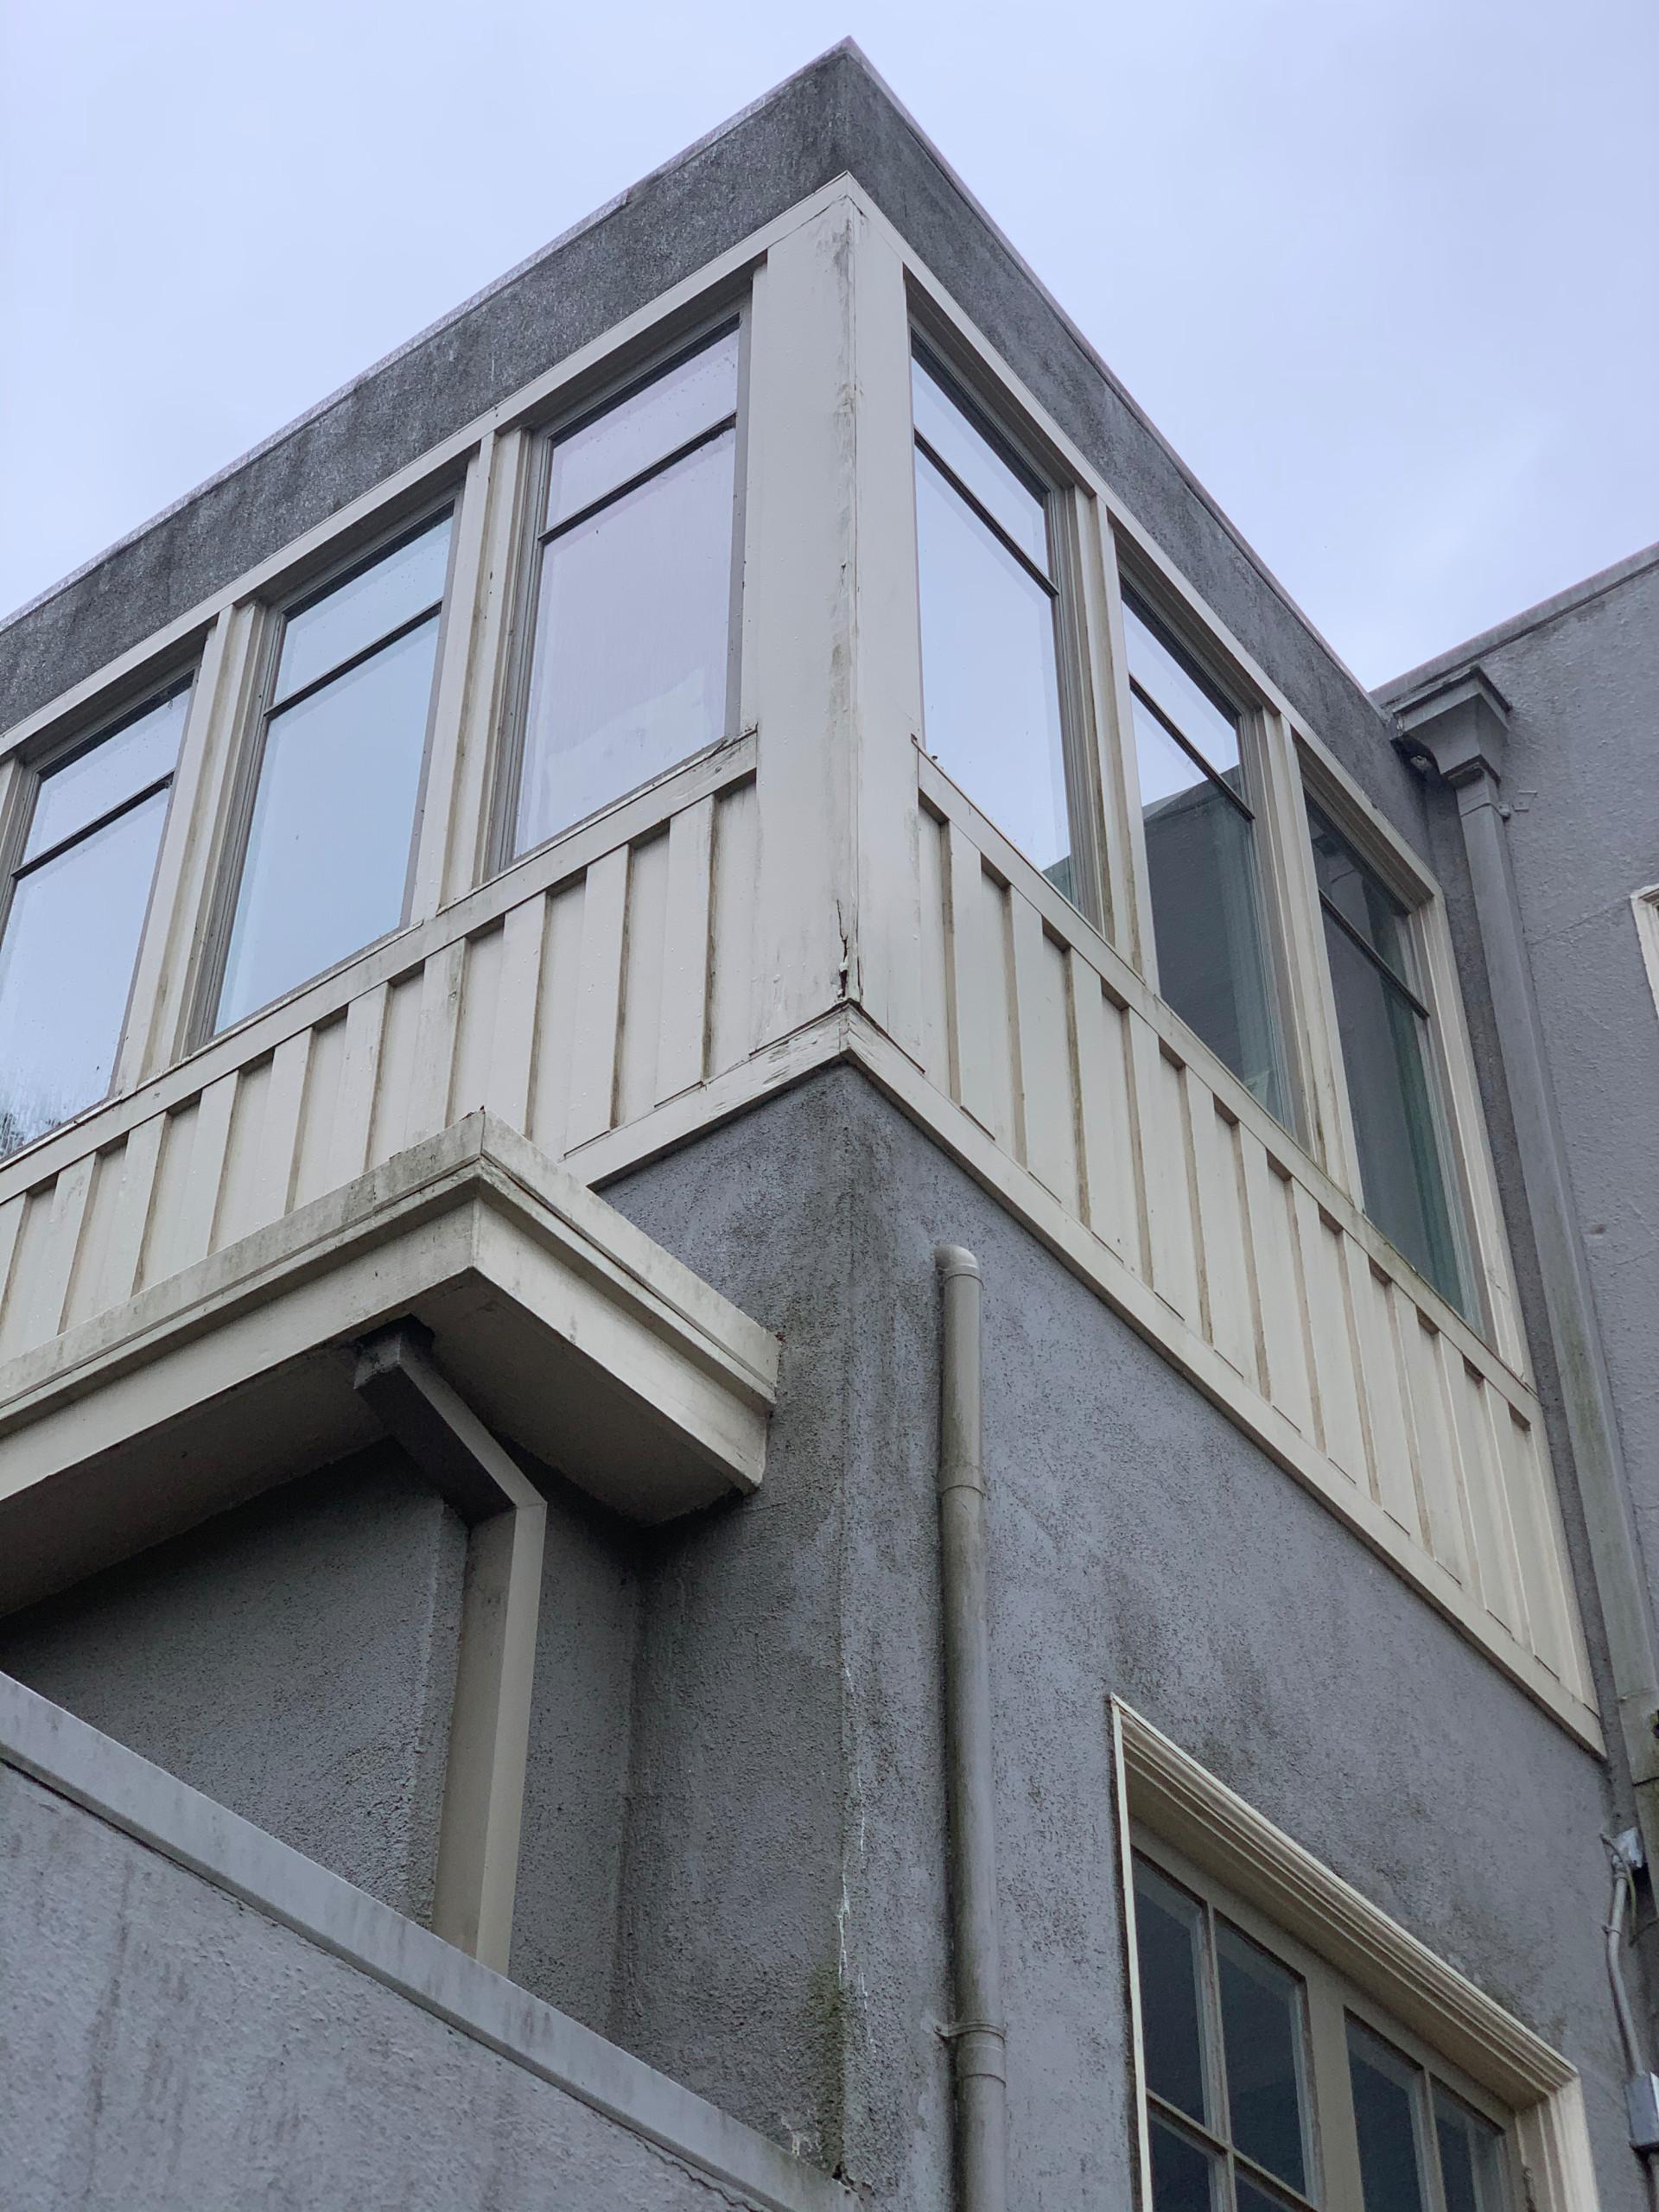 Exterior Painting & Trim/Siding Repair